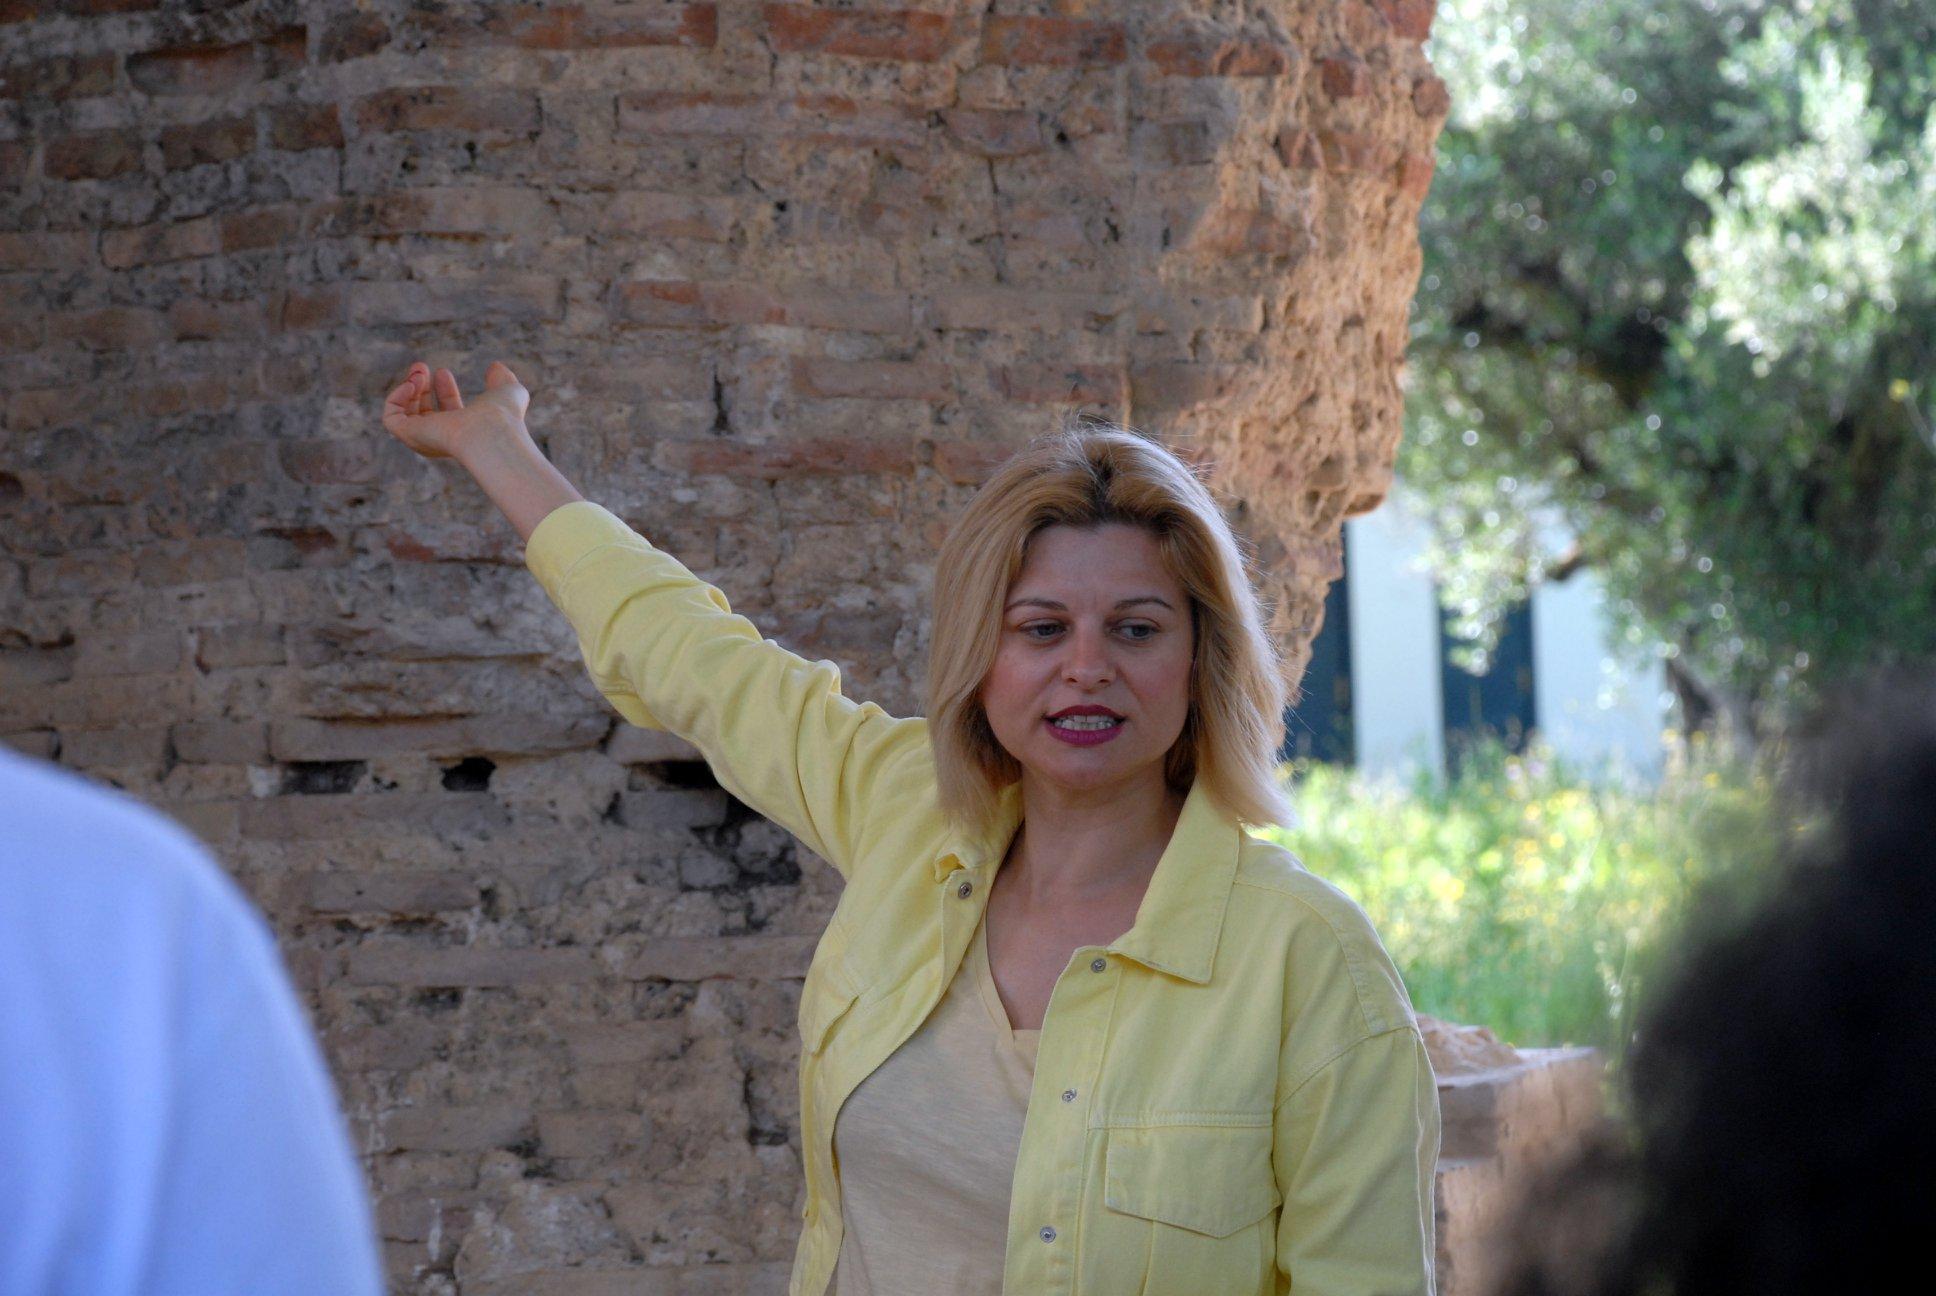 14o Διεθνές Φοιτητικό Βυρωνικό Συνέδριο, Επίσκεψη στις Ρωμαϊκές Θέρμες Αγίου Θωμά